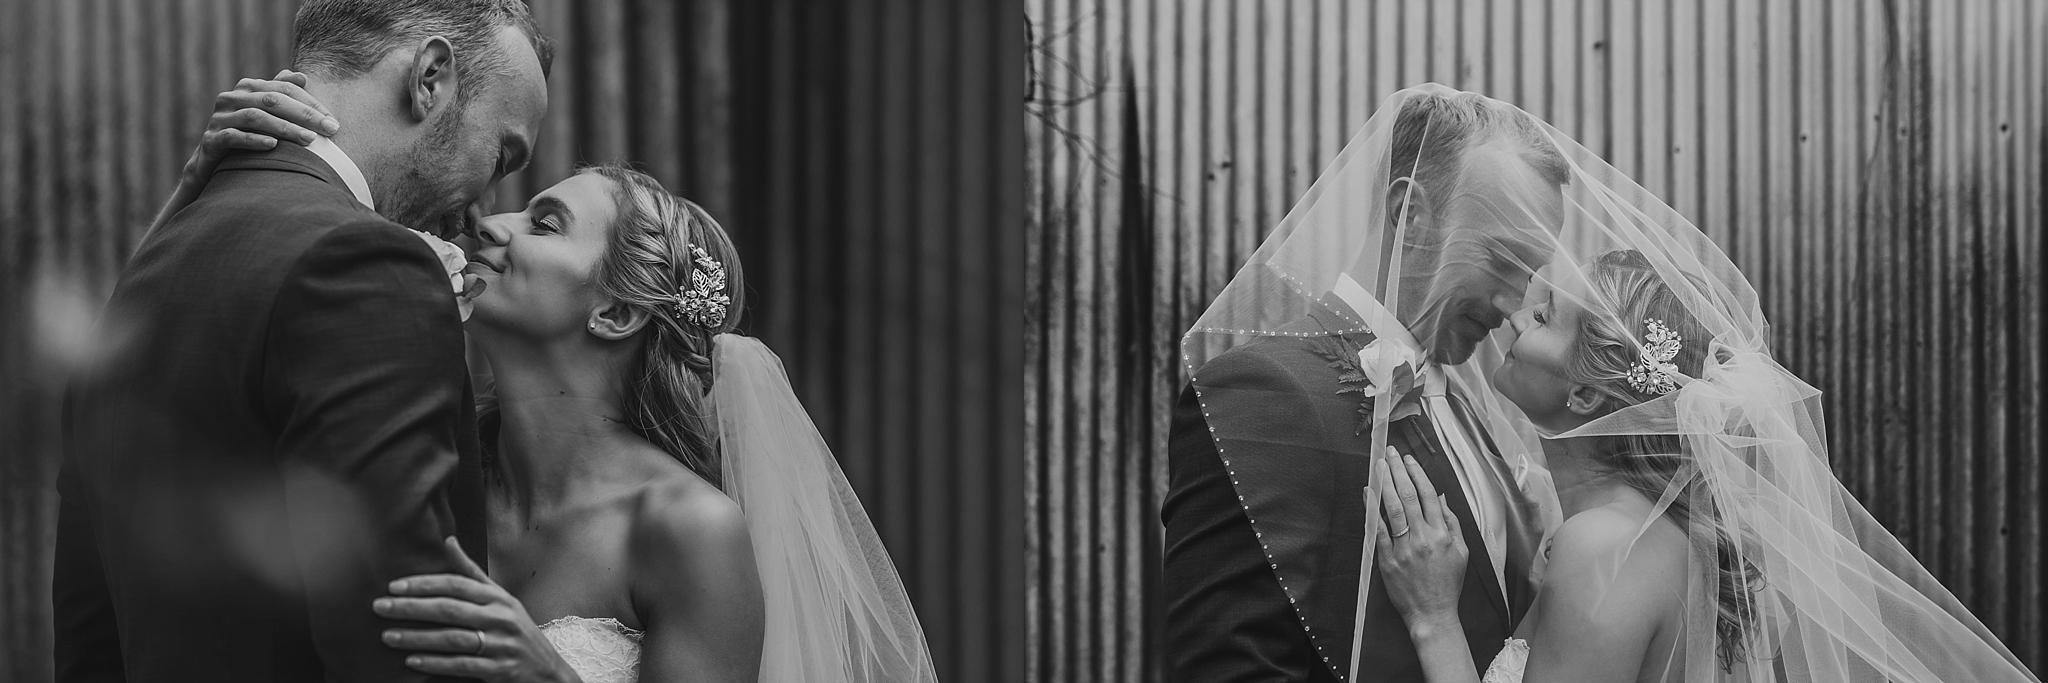 bride and groom veil shots